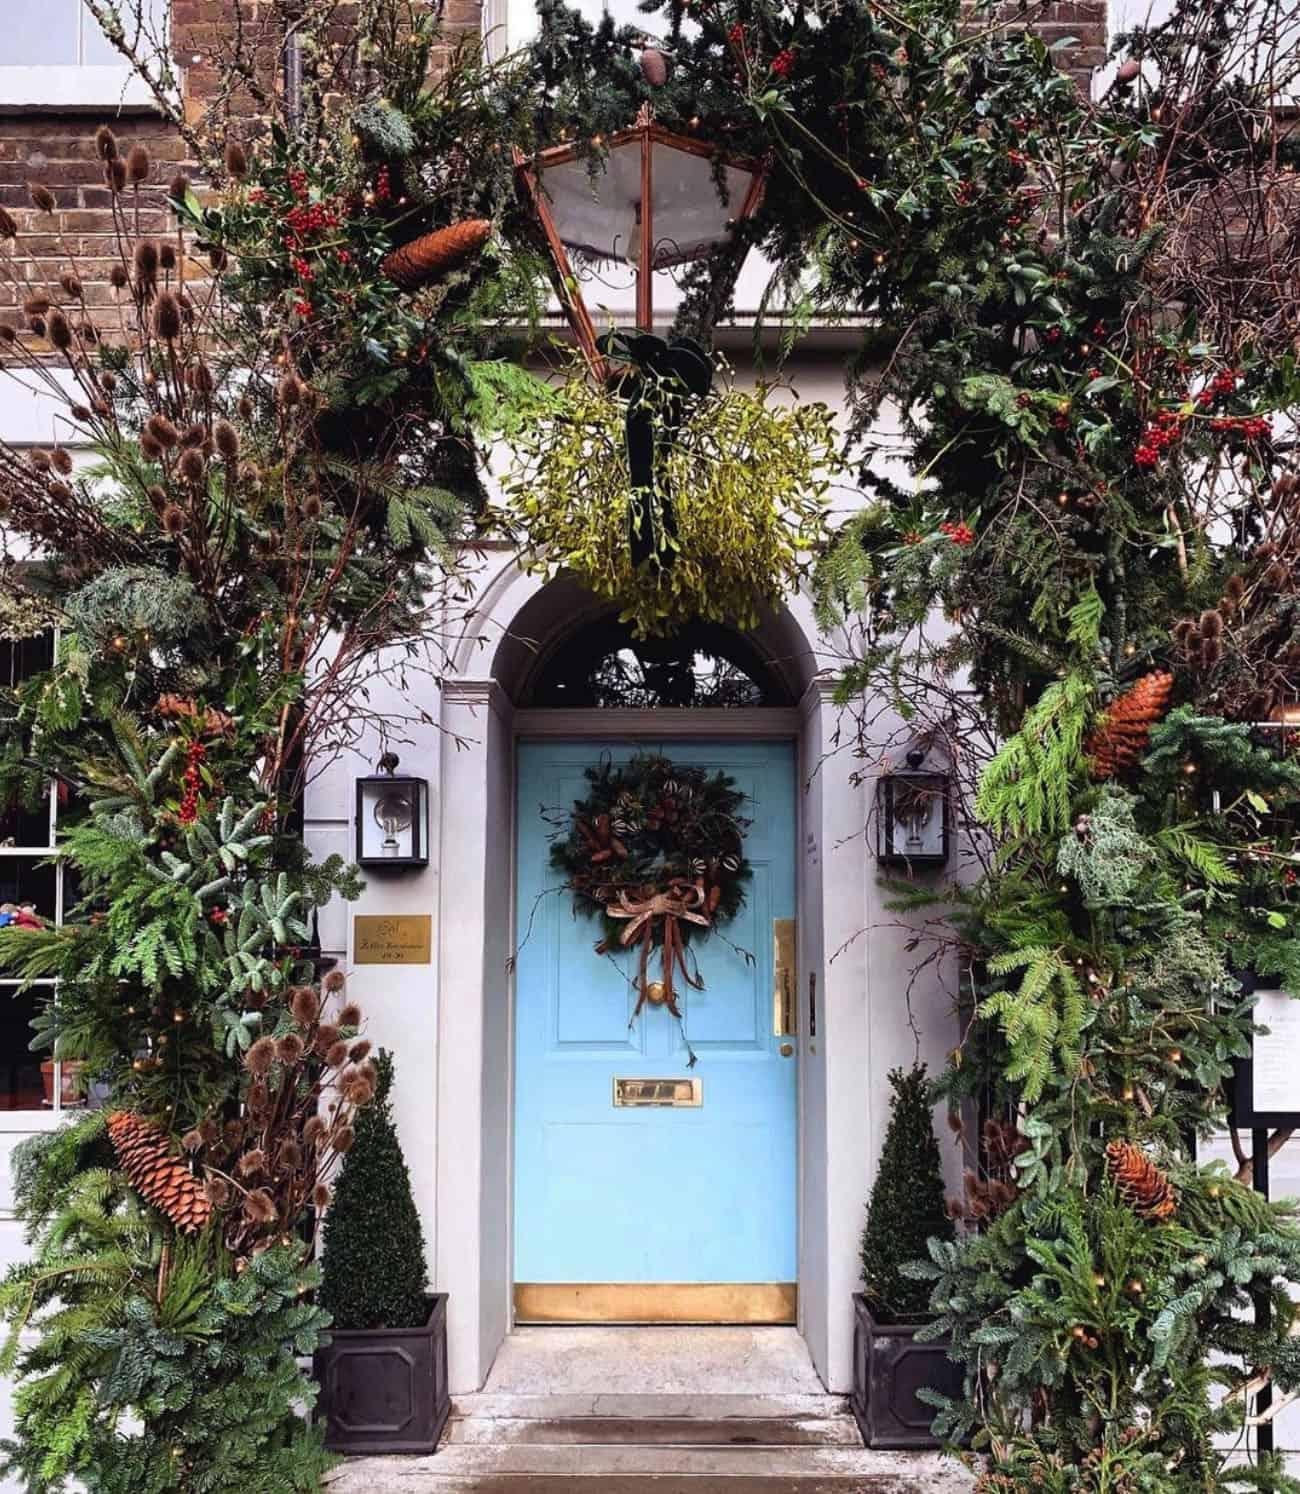 holiday-decor-ideas-townhouse-door